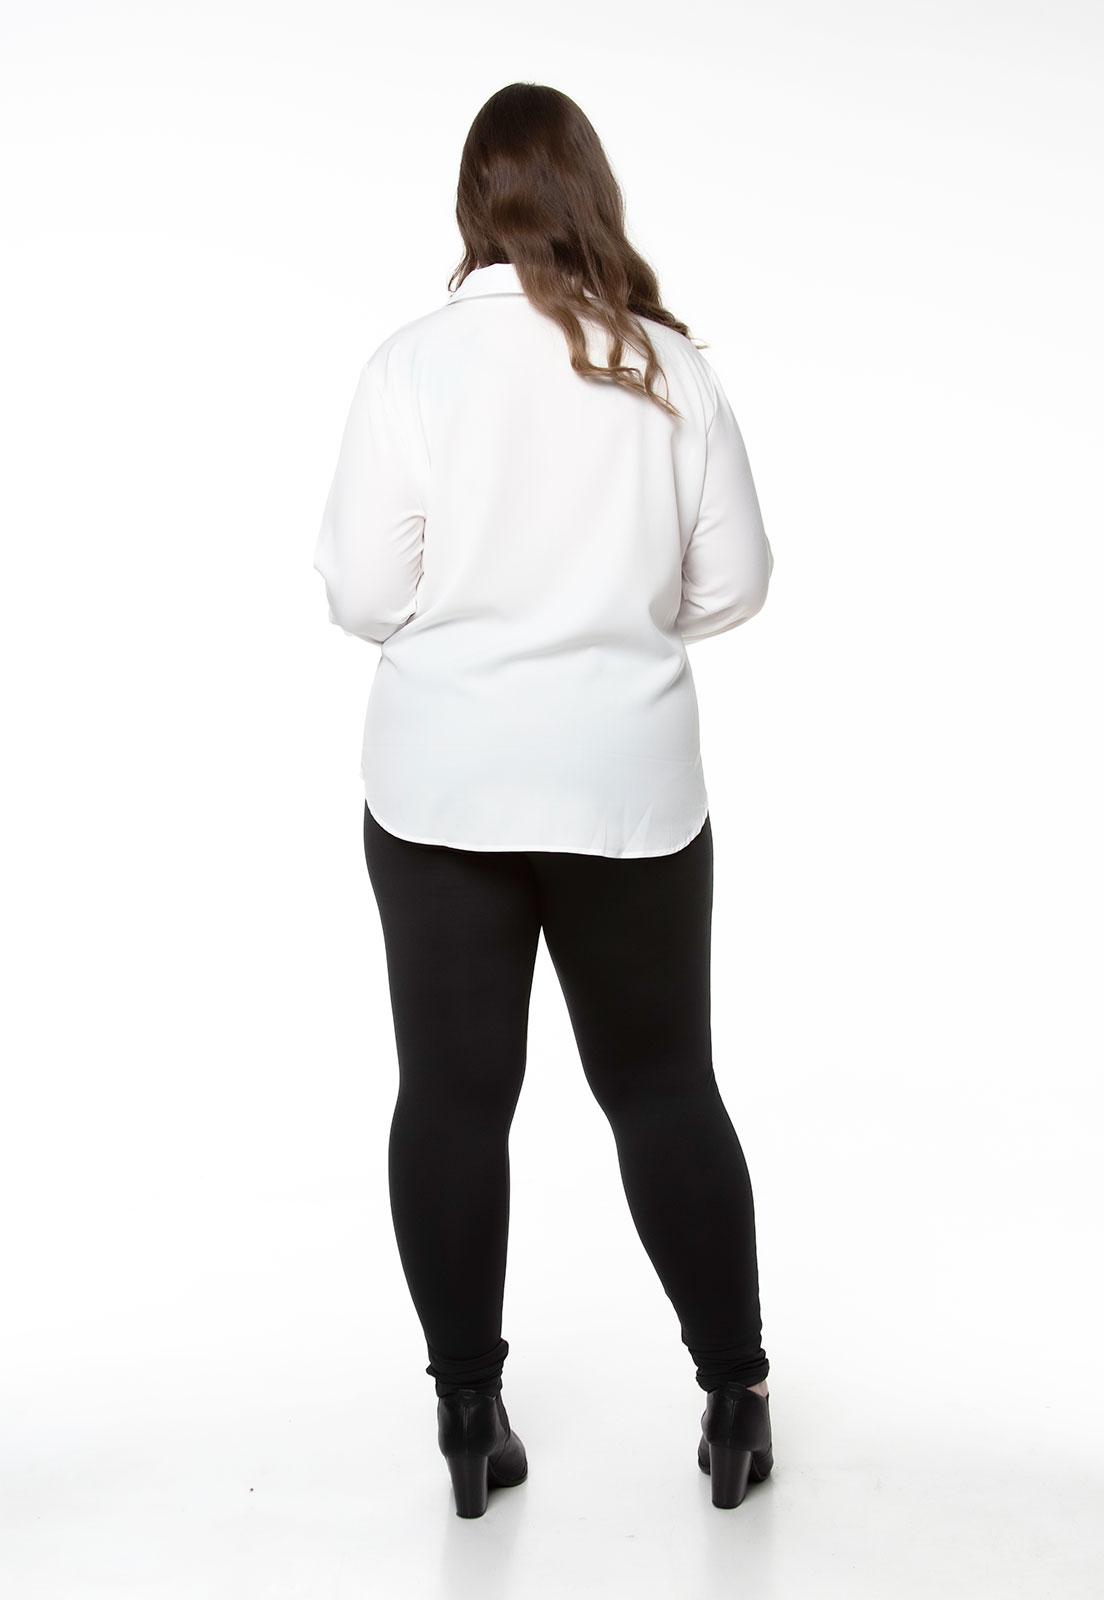 Camisa branca lisa com elastano